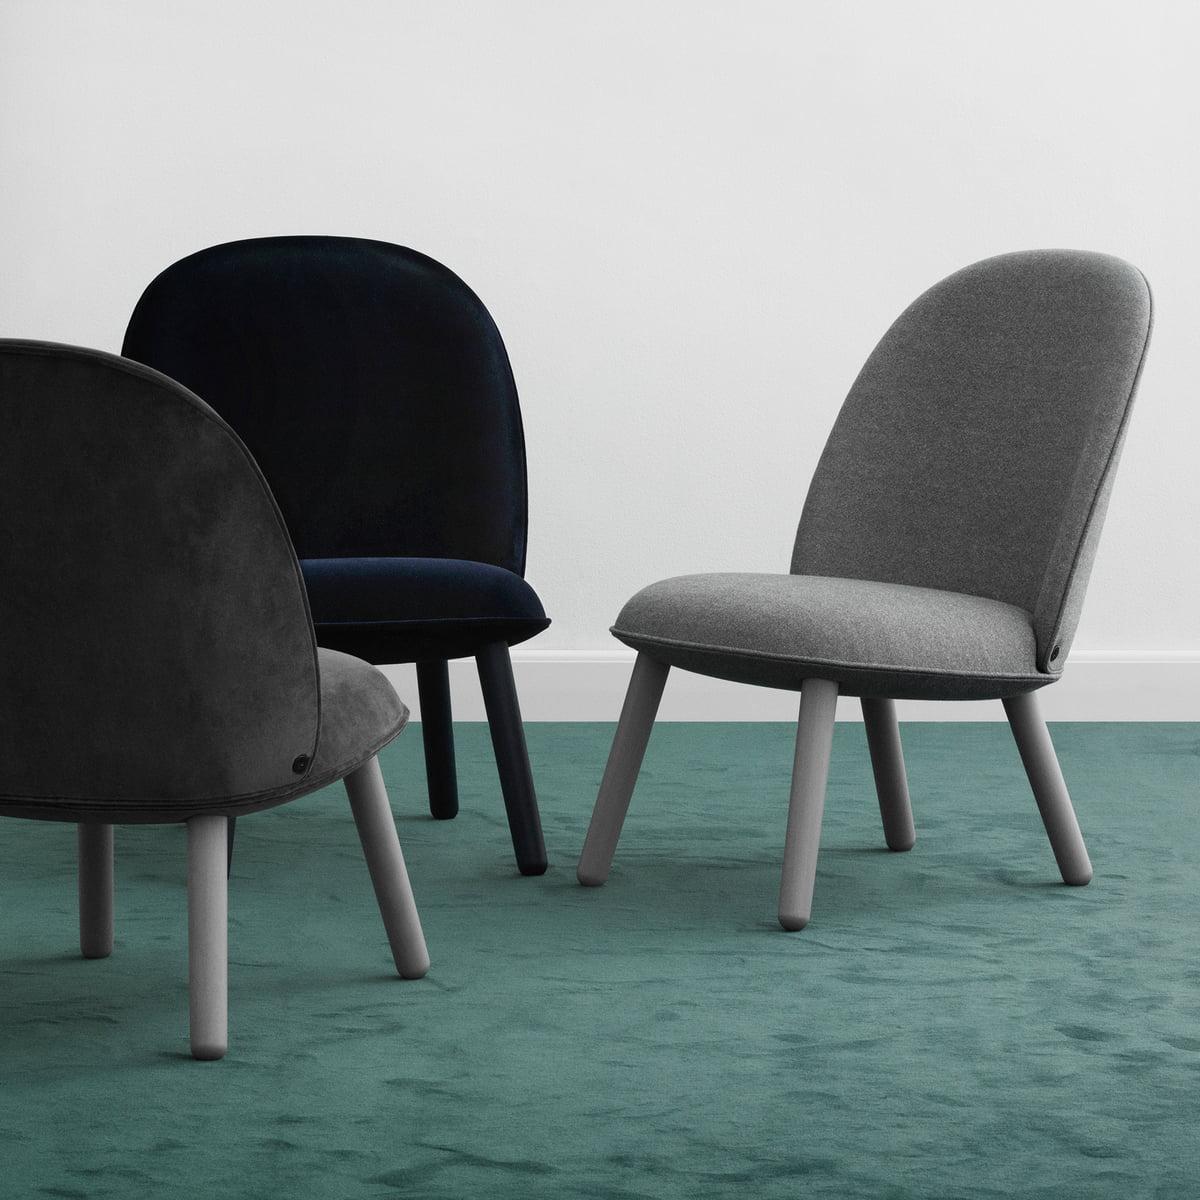 Stupendous Normann Copenhagen Ace Lounge Chair Koord Eik Beige Hoofdlijn Vlas Upminster Mlf 20 Camellatalisay Diy Chair Ideas Camellatalisaycom